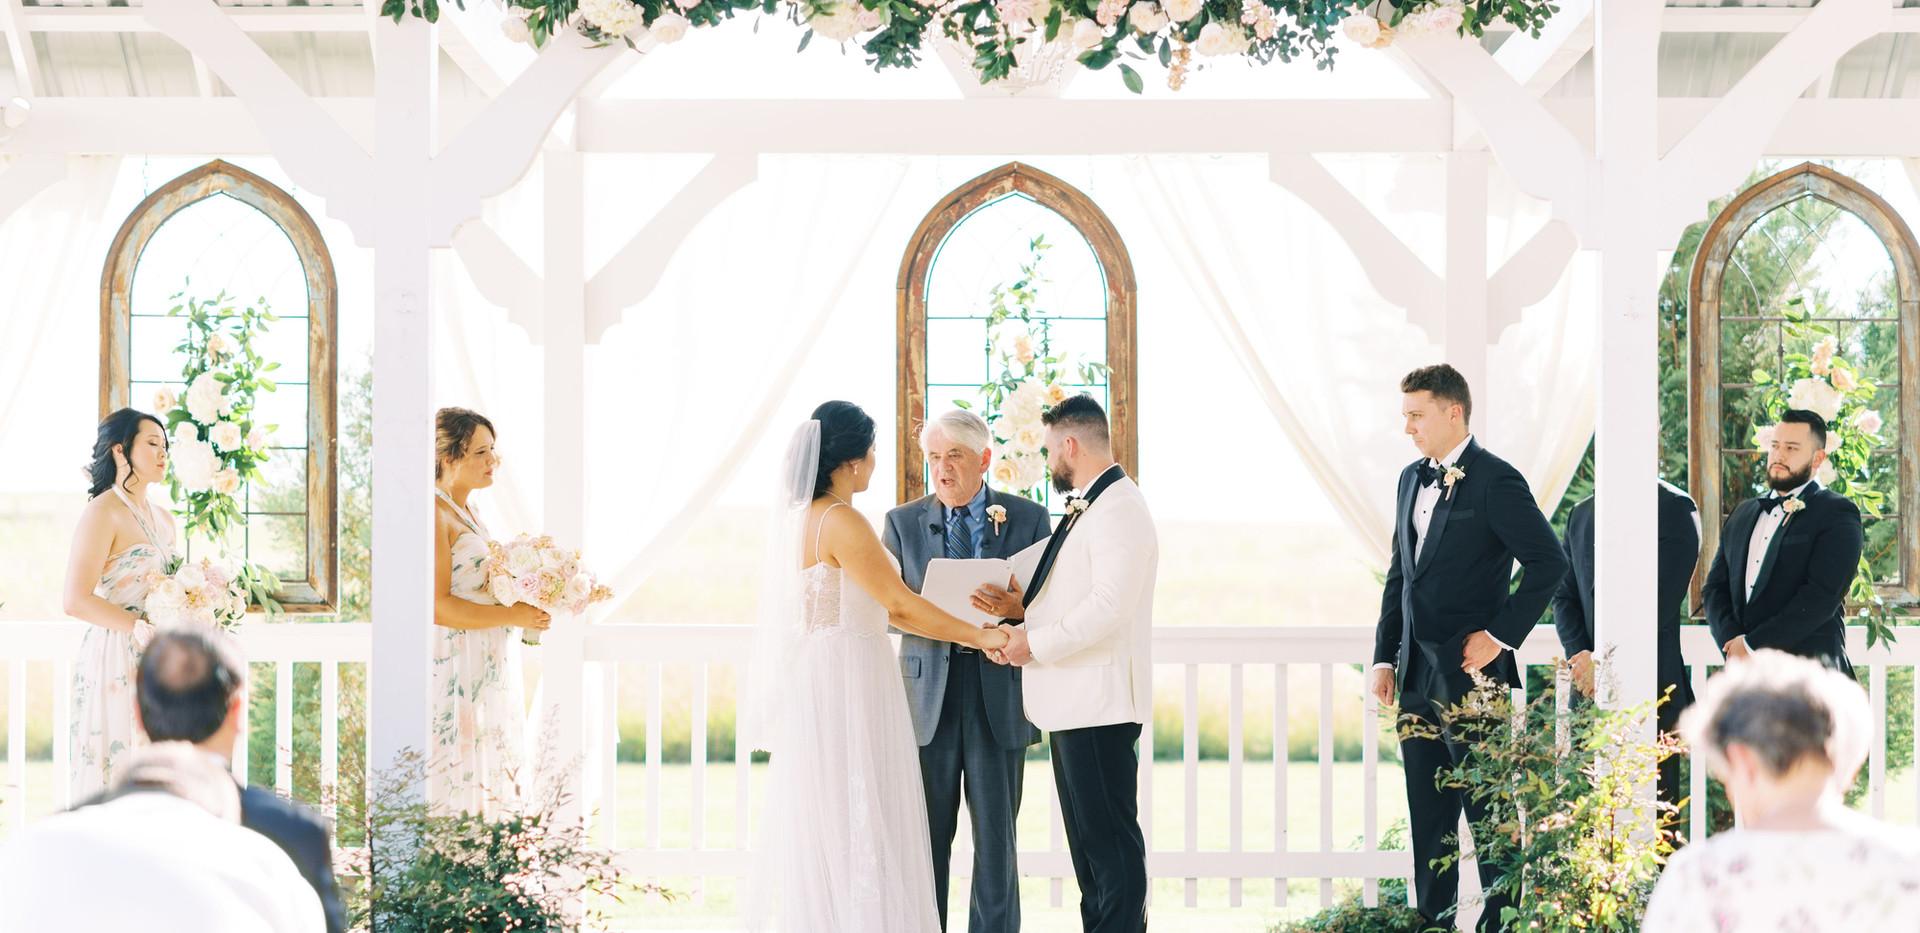 Ceremony close up Tiffany & Brandon Madd